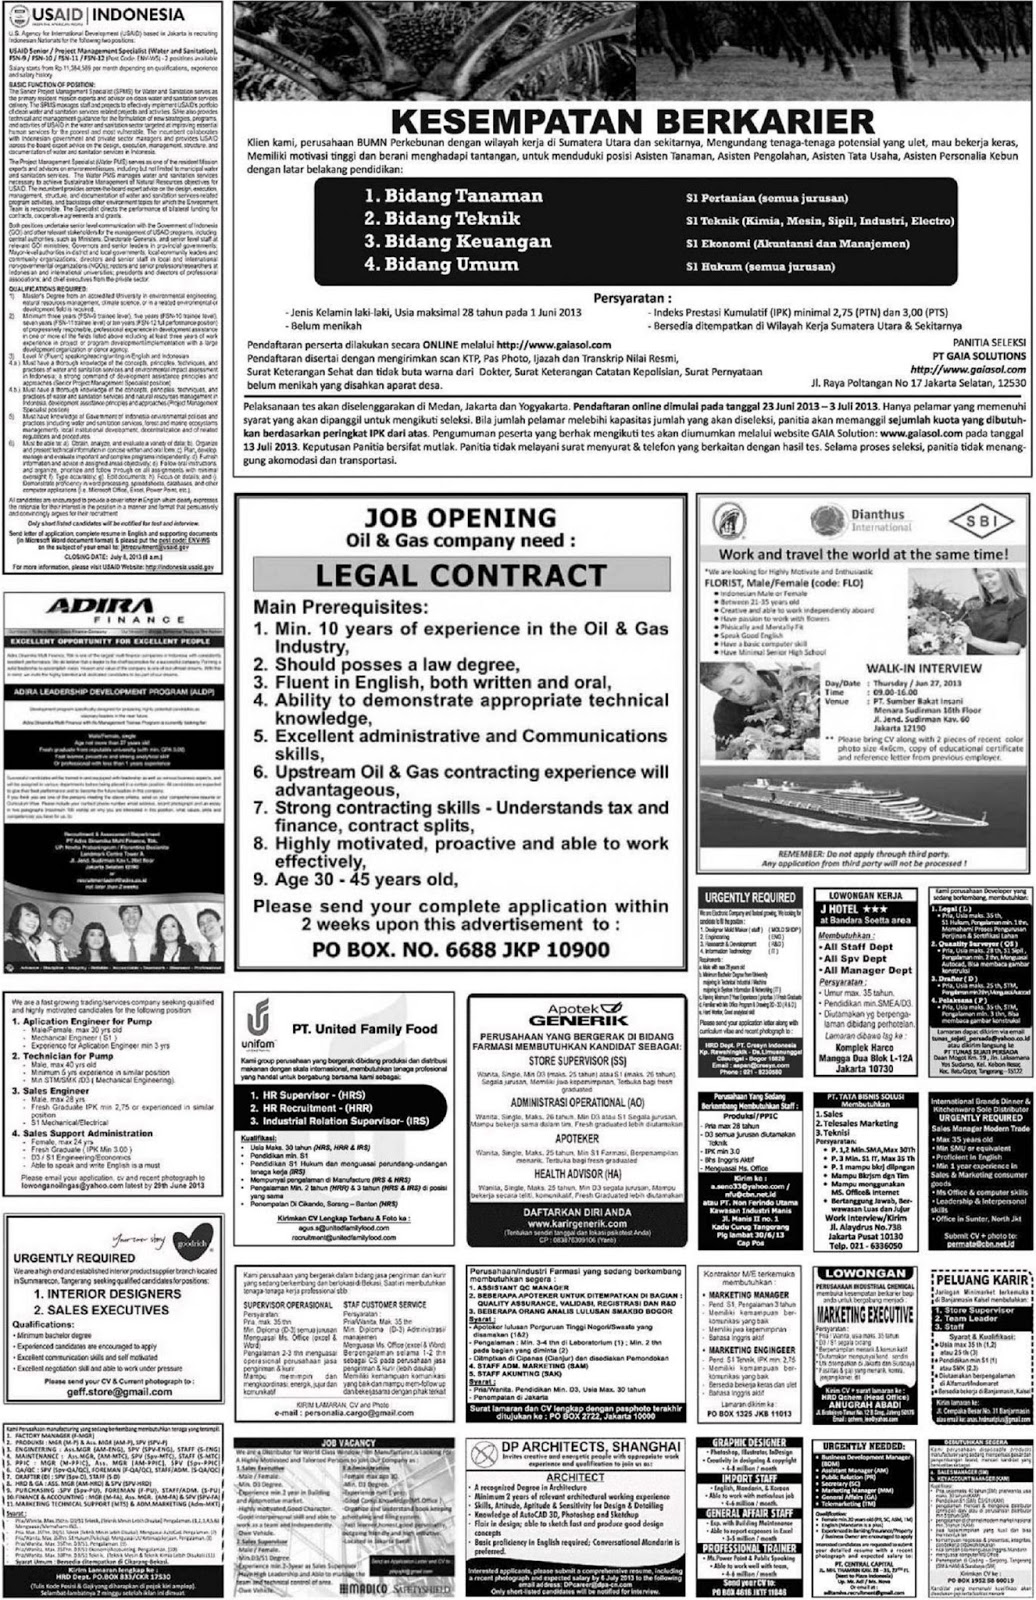 Info Loker Terbaru 2013 Klaten Portal Info Lowongan Kerja Terbaru Di Solo Raya Read More On Portal Info Lowongan Kerja Di Yogyakarta Terbaru 2016